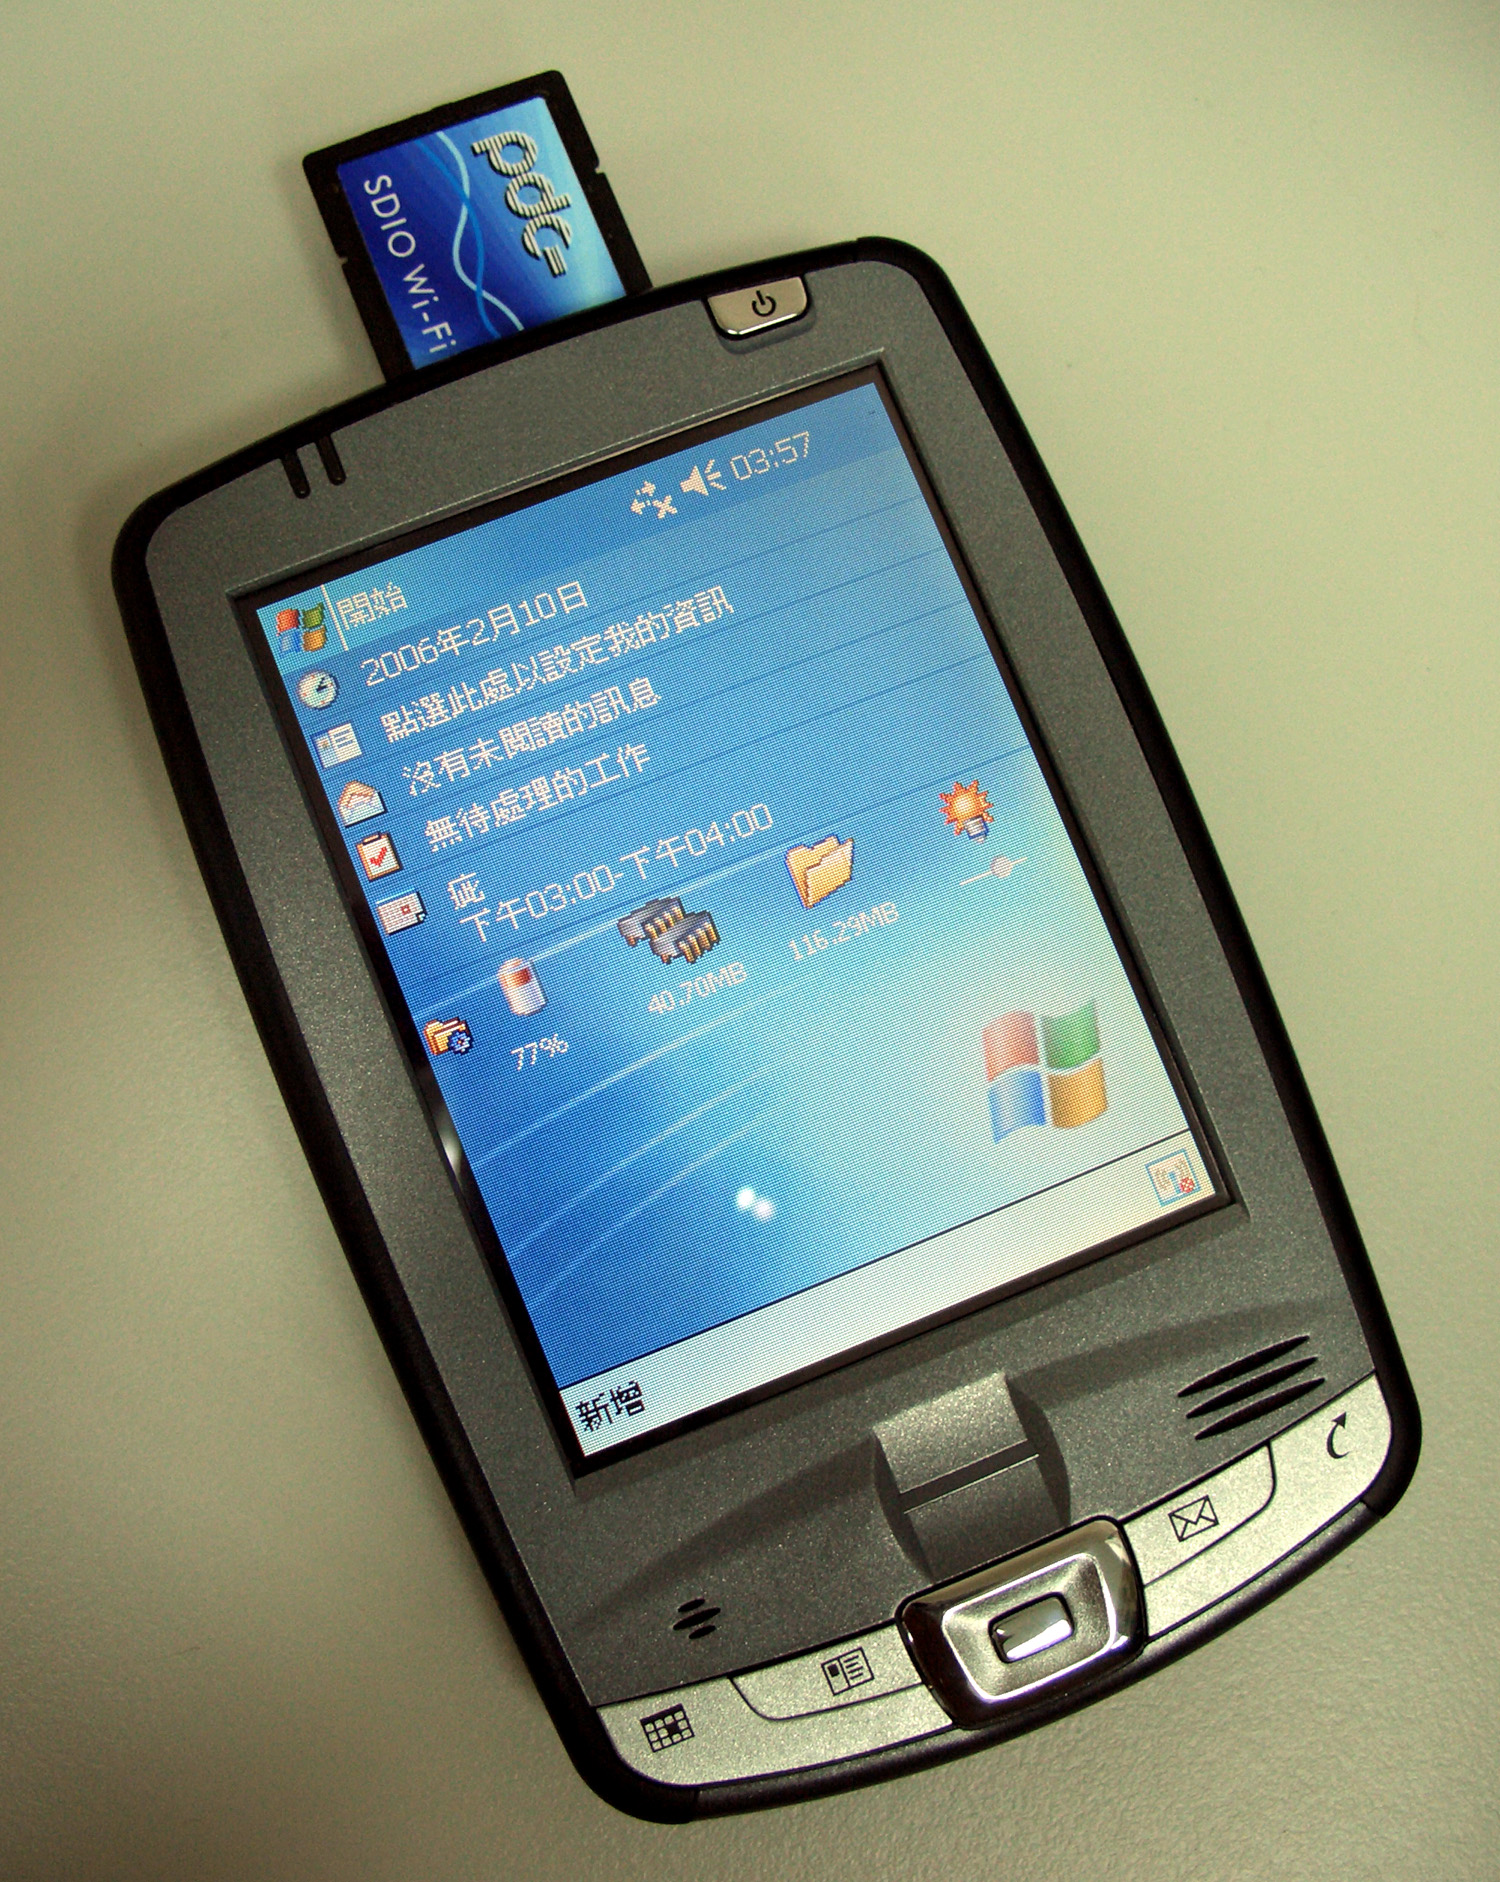 PDC Eezcon - Allows Multitasking